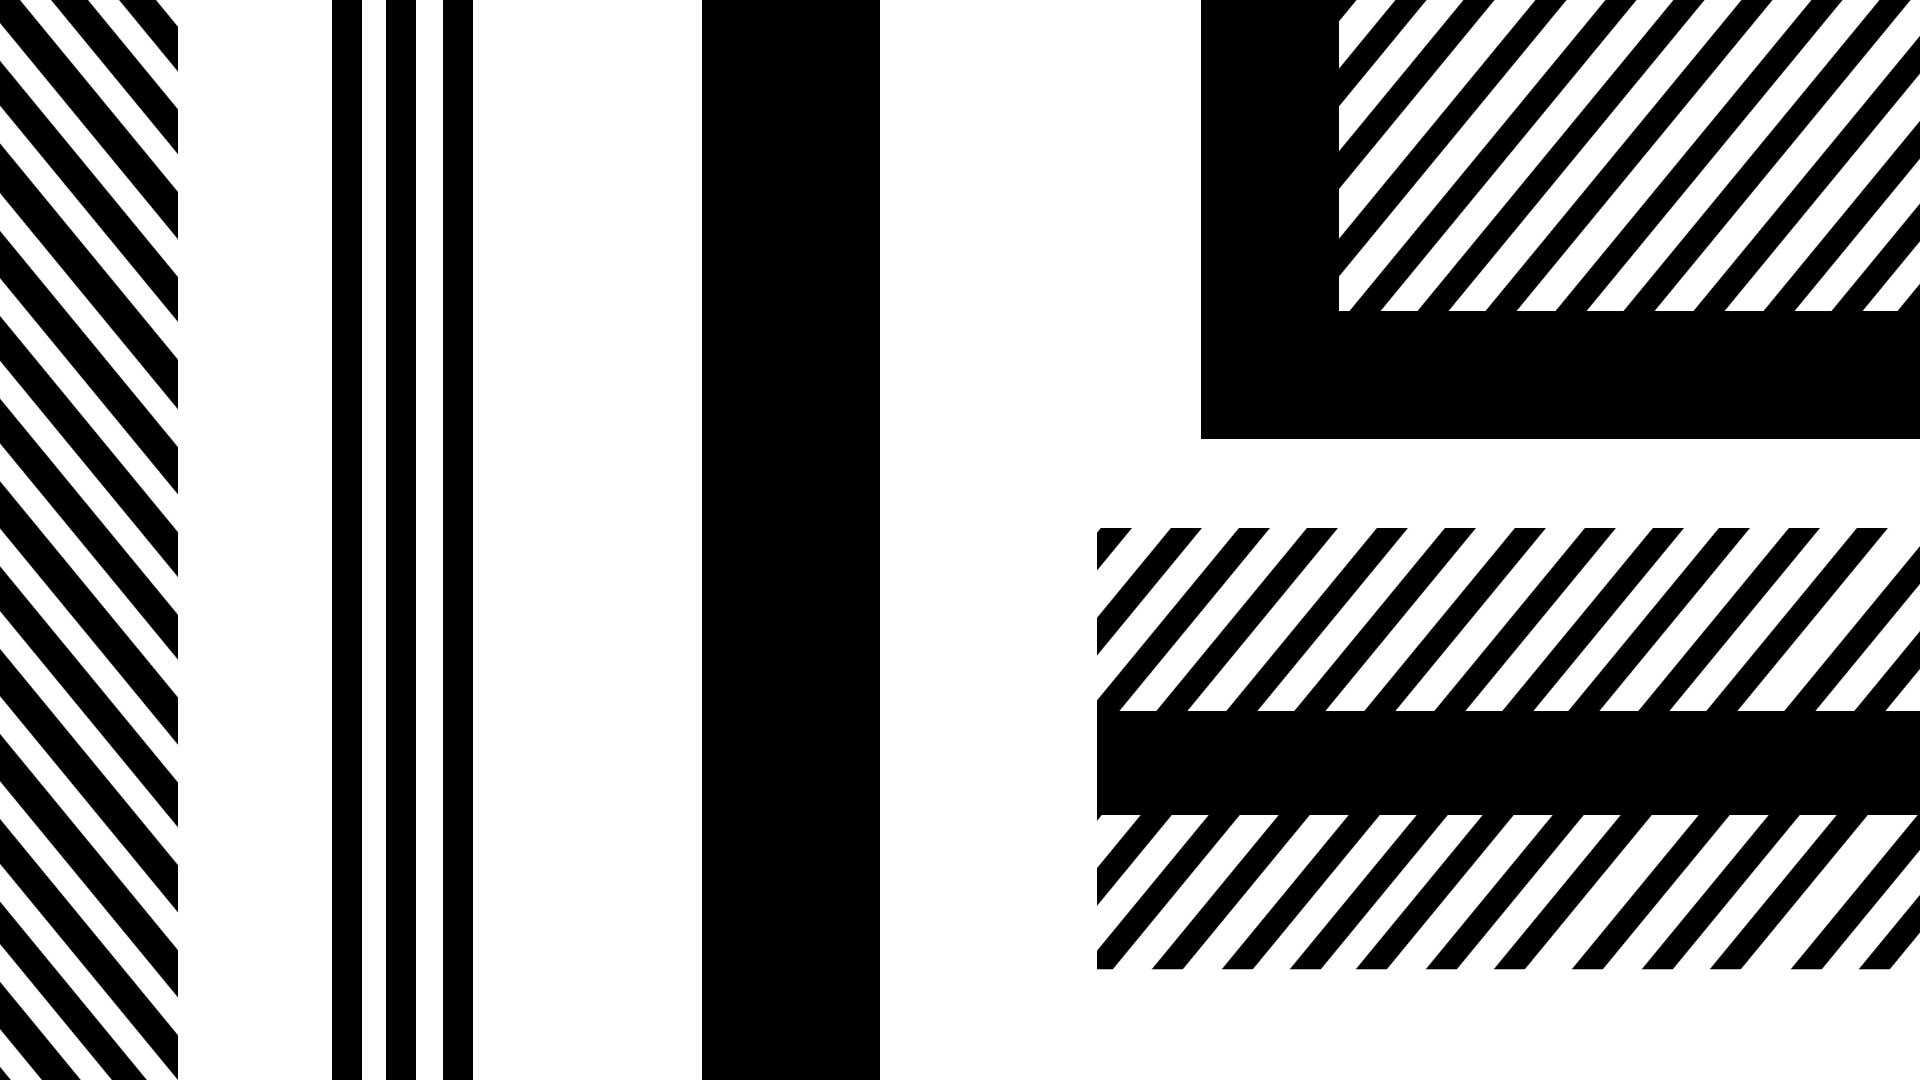 Black Stripes Papel De Parede Hd Plano De Fundo 1920x1080 Id